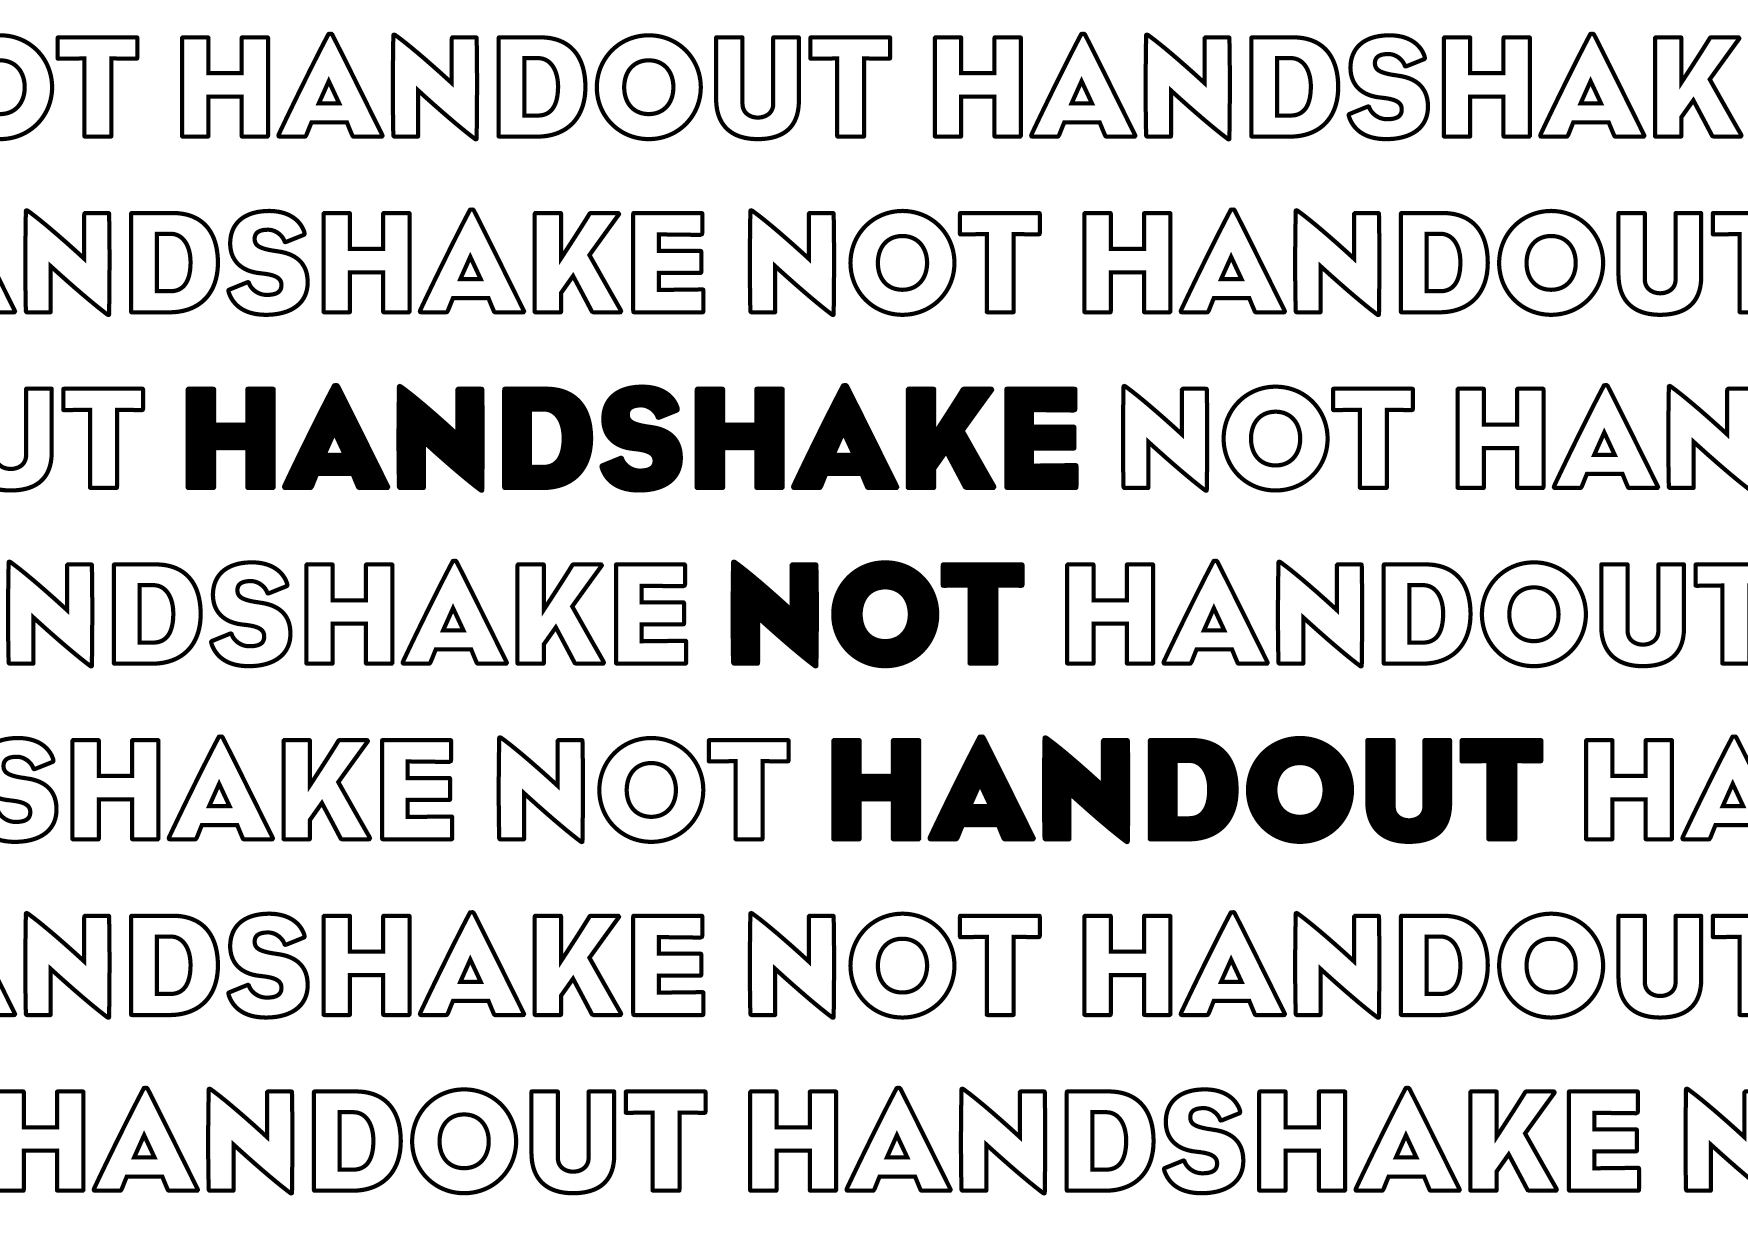 Handshake-Postcard-2.png